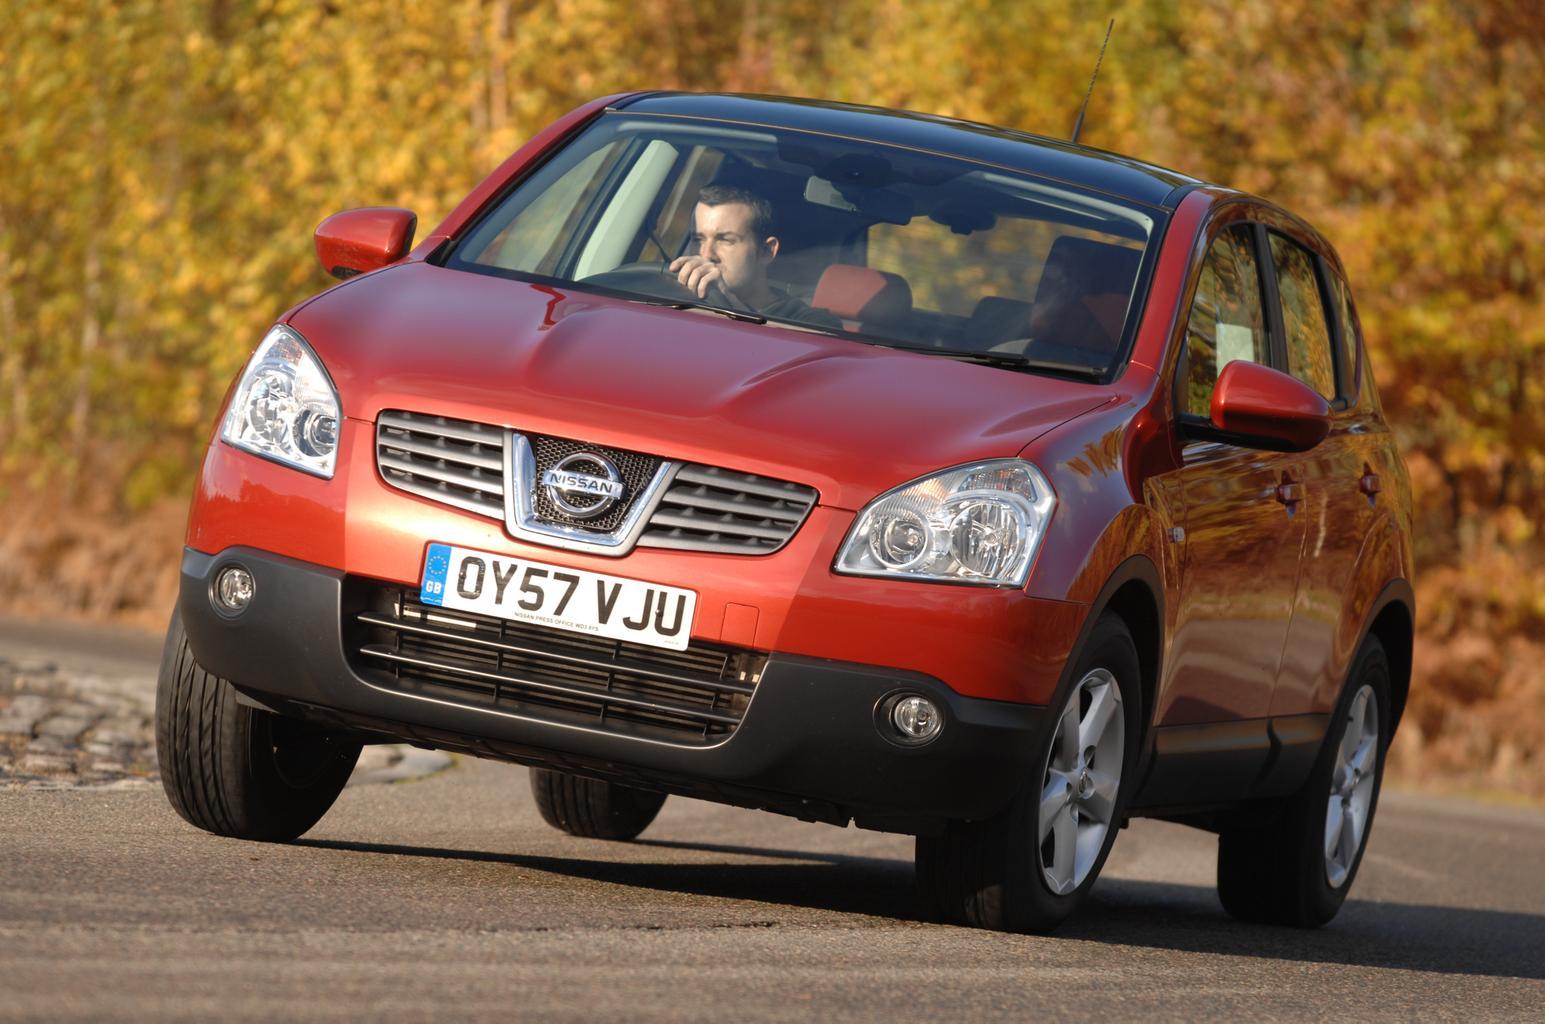 10 reasons to buy a Nissan Qashqai